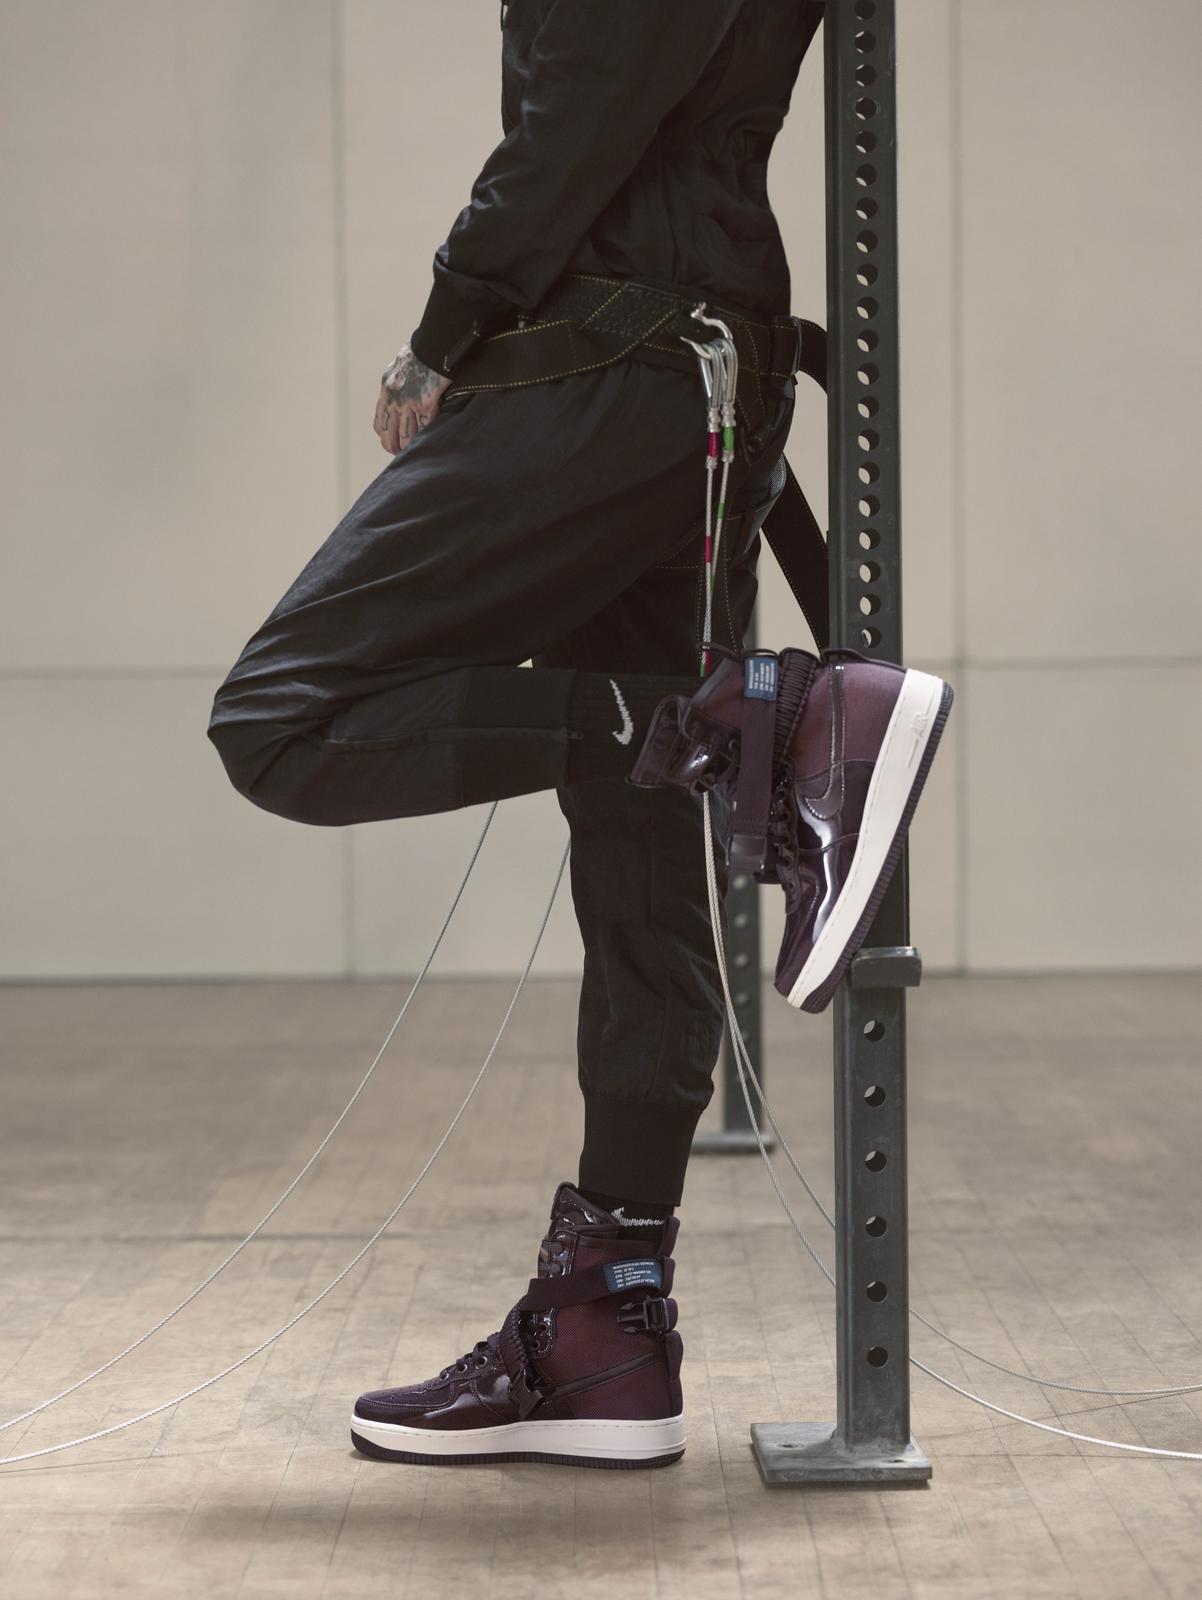 FemaleQuand La Femme Is The Force Célèbre Nike erxdCoB